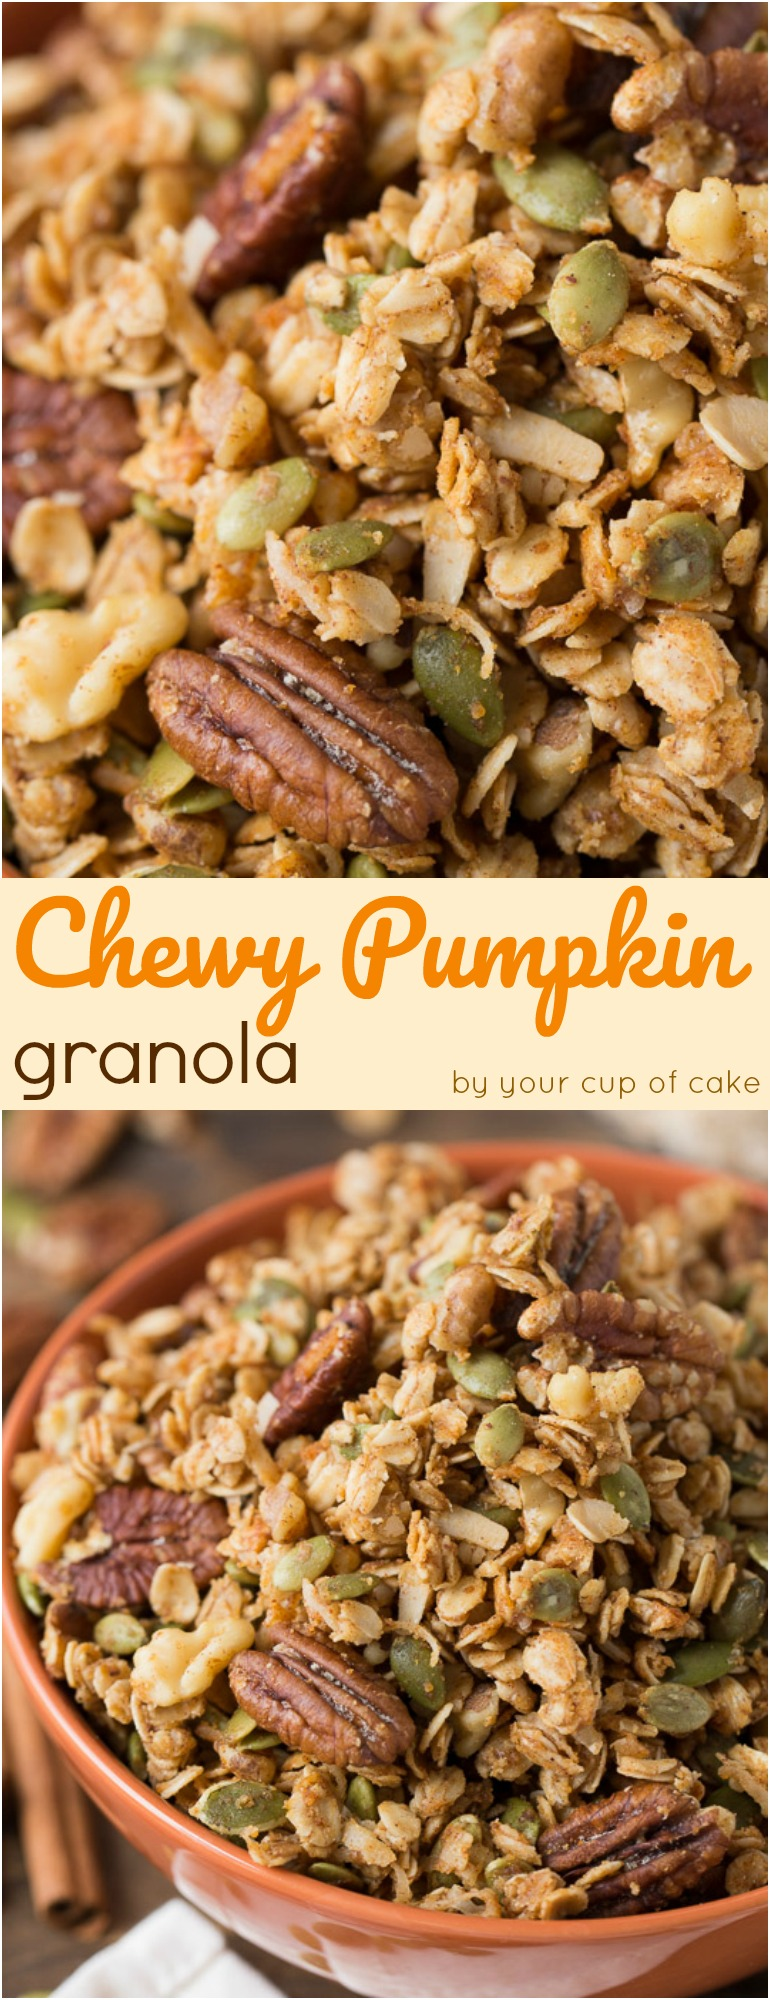 The Best Chewy Pumpkin Granola